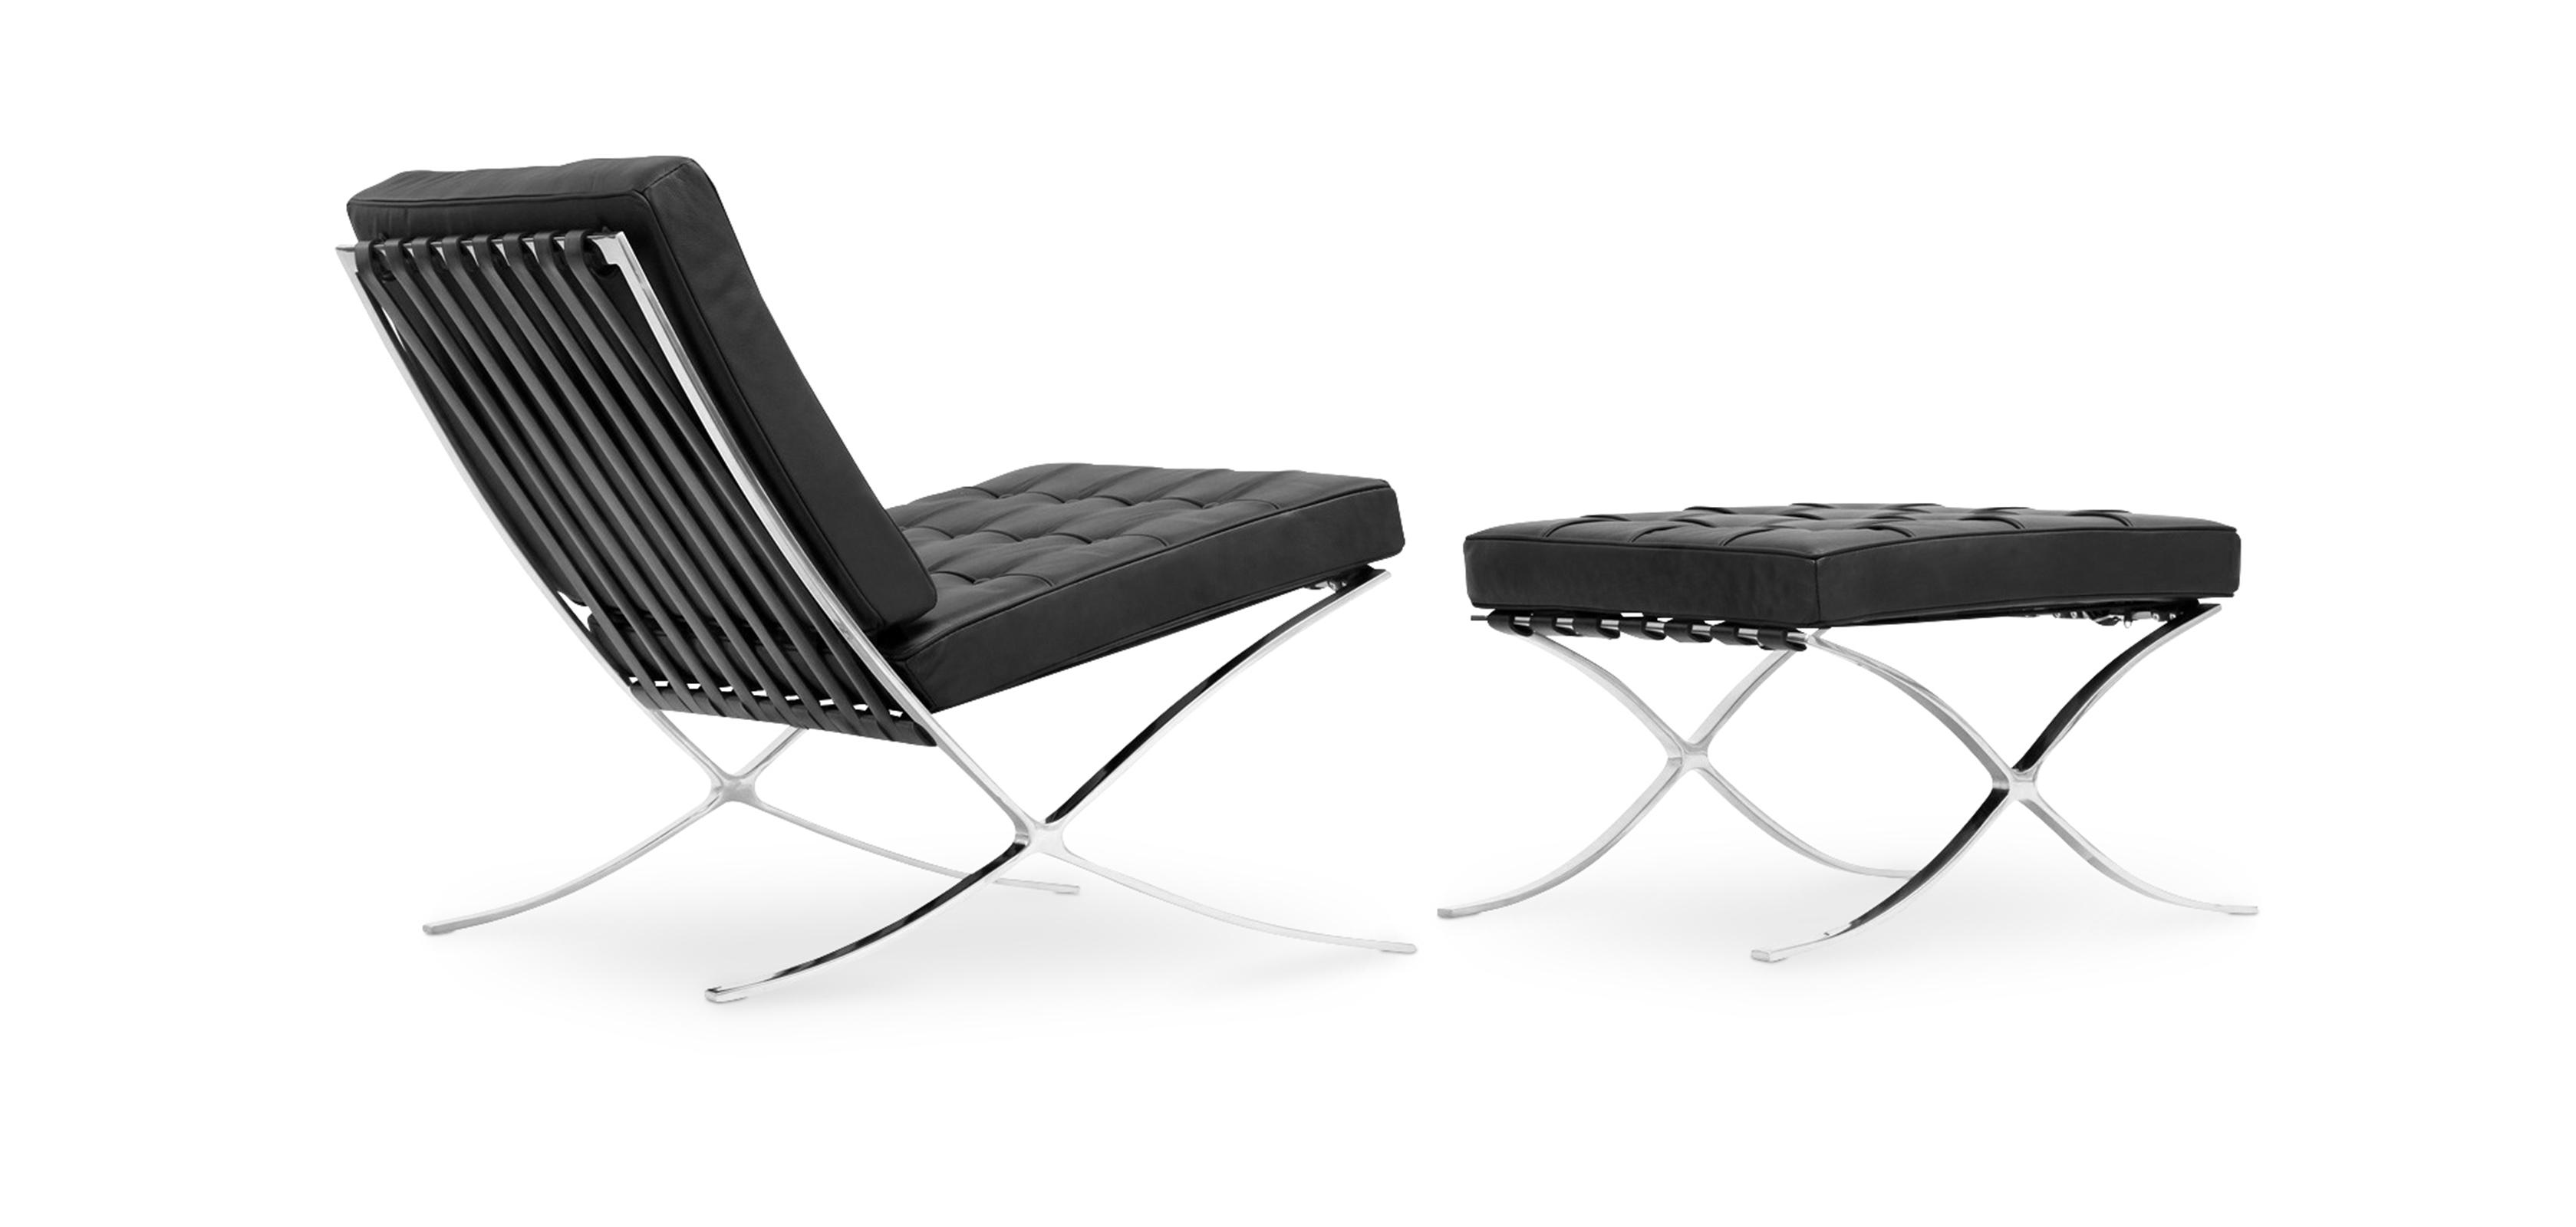 fauteuil barcelona ottoman ludwig mies van der rohe. Black Bedroom Furniture Sets. Home Design Ideas